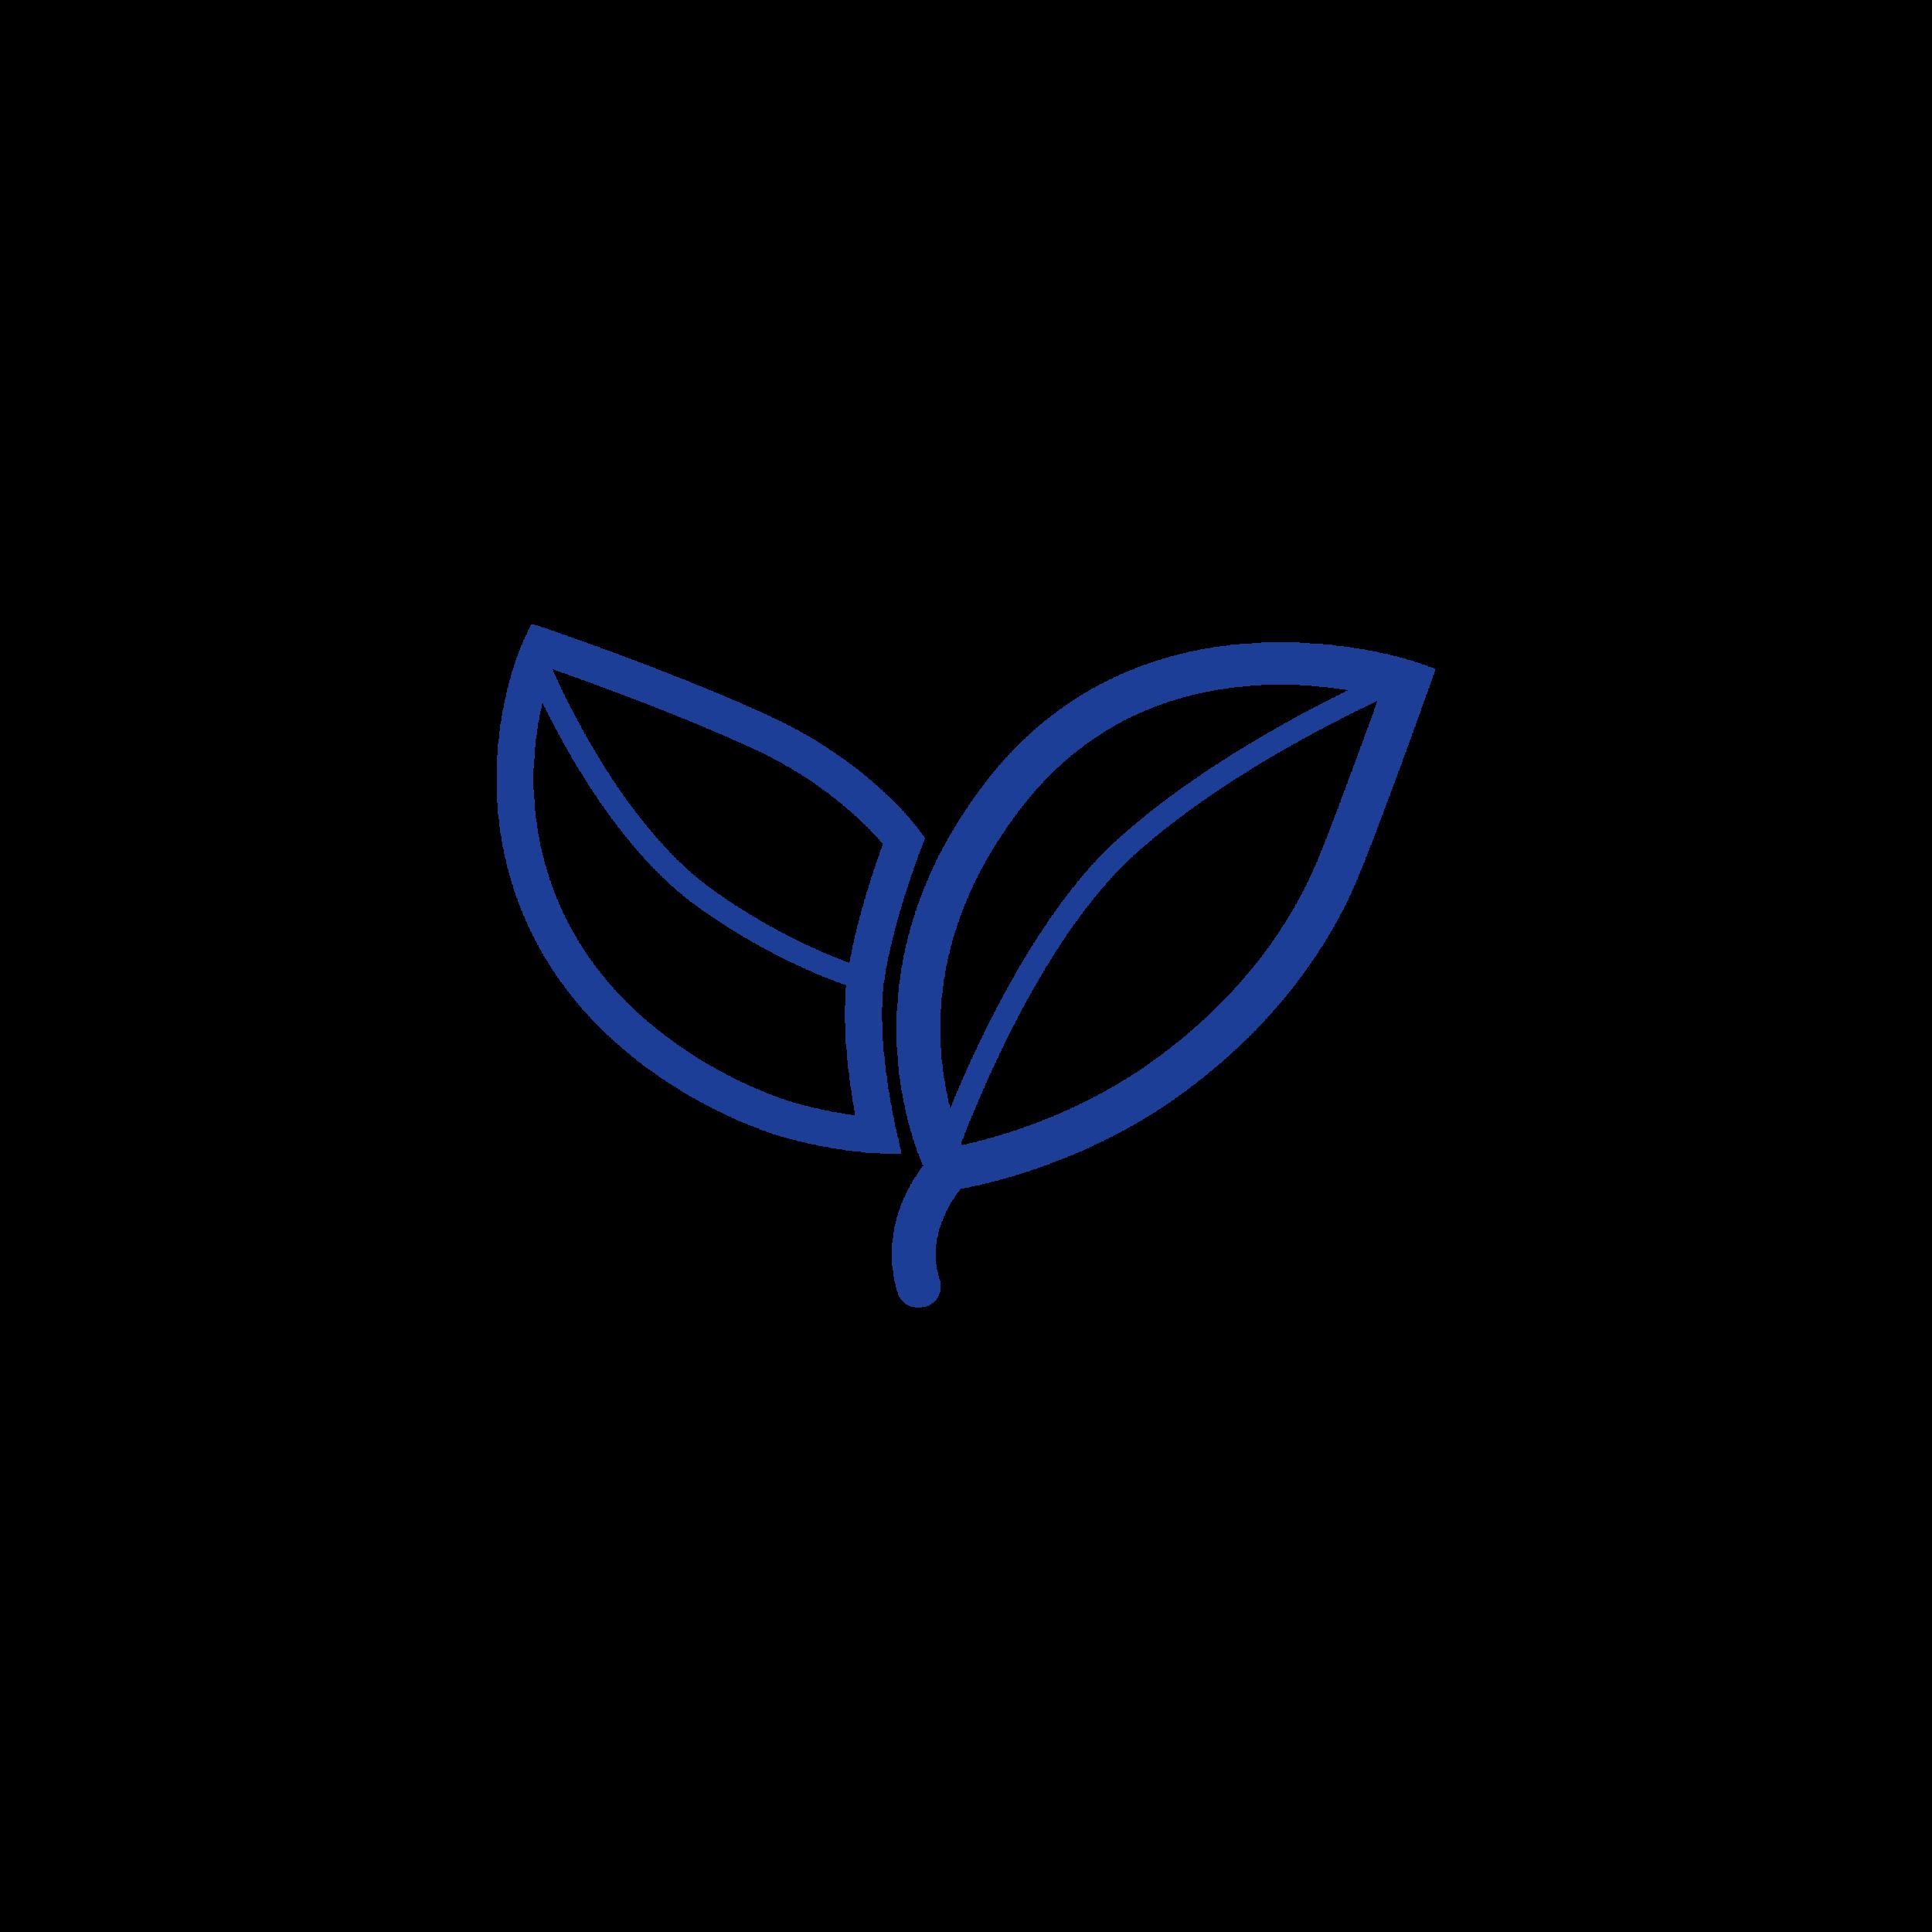 Leaf-01 (1).png